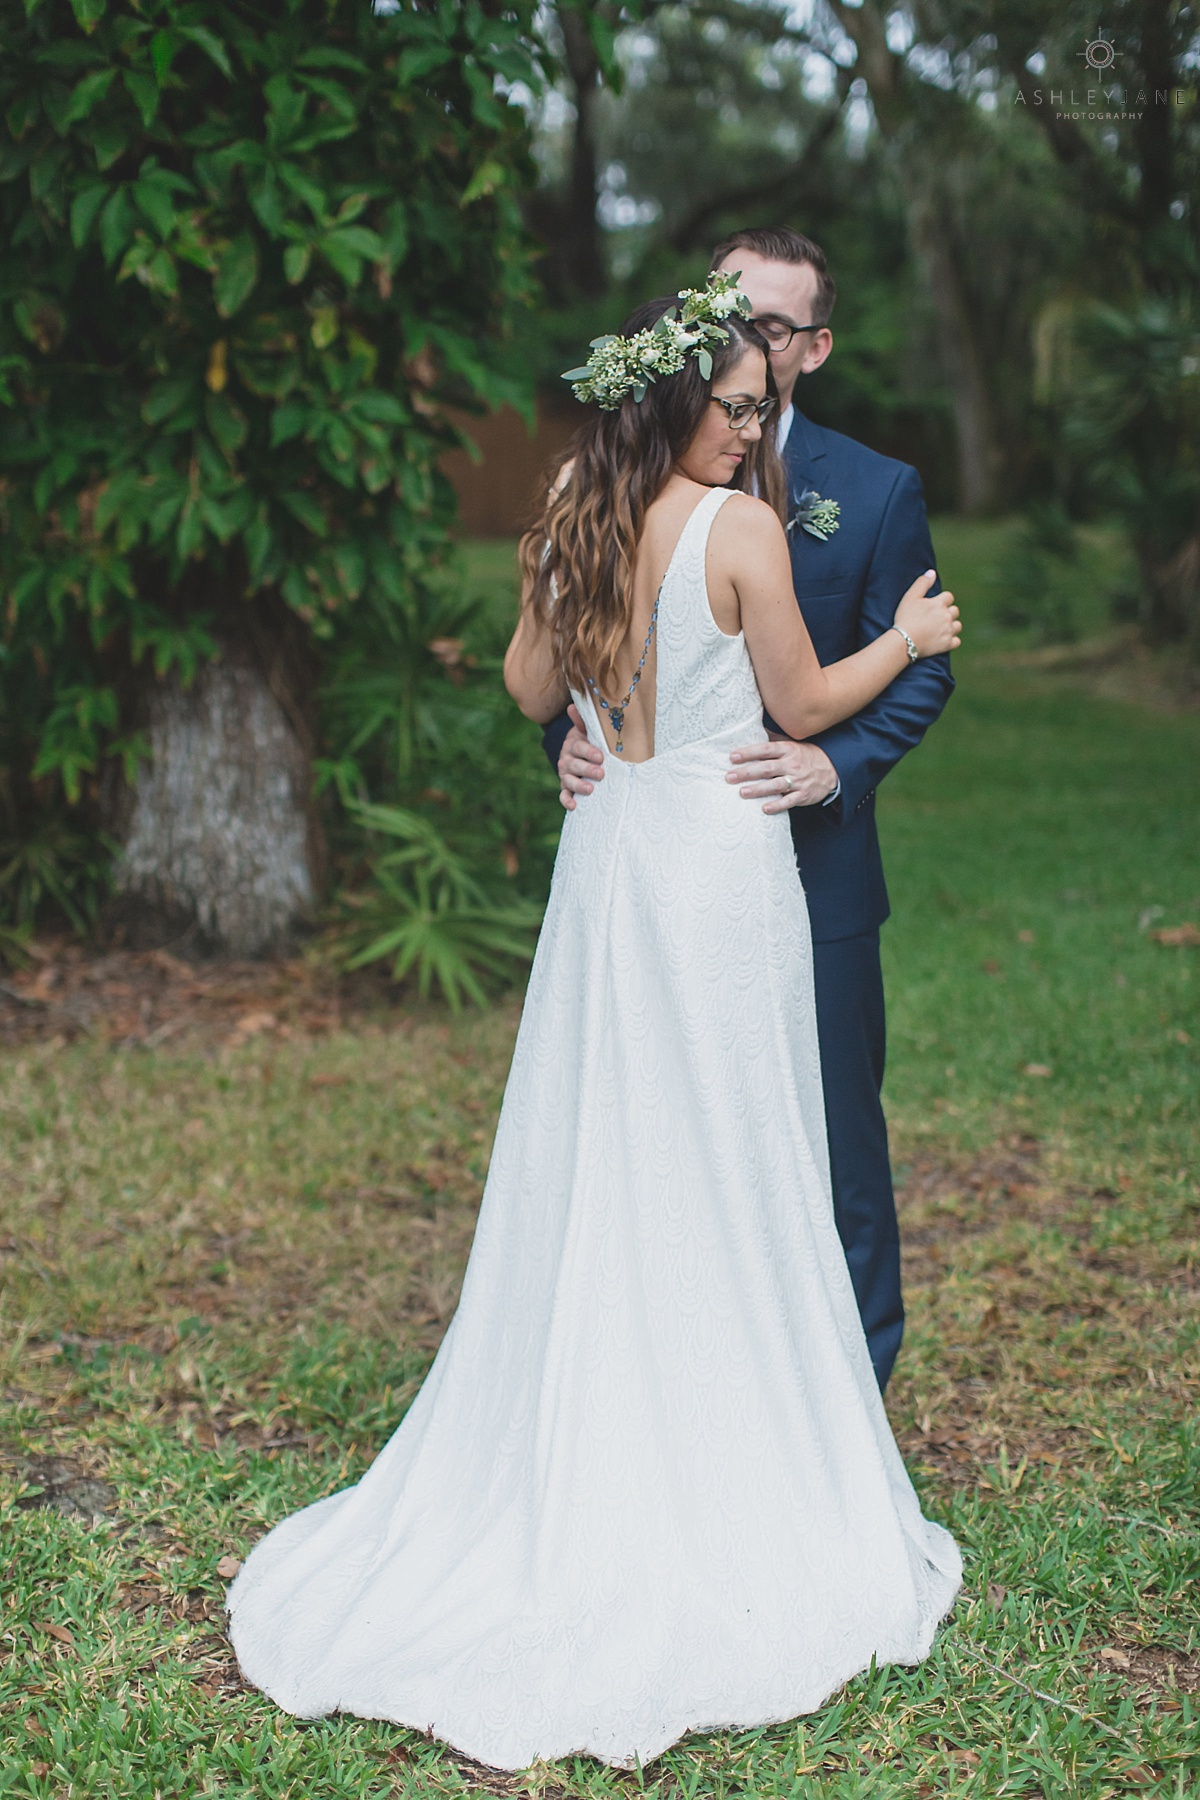 Eclectic Boho Backyard Wedding Orlando Photographer